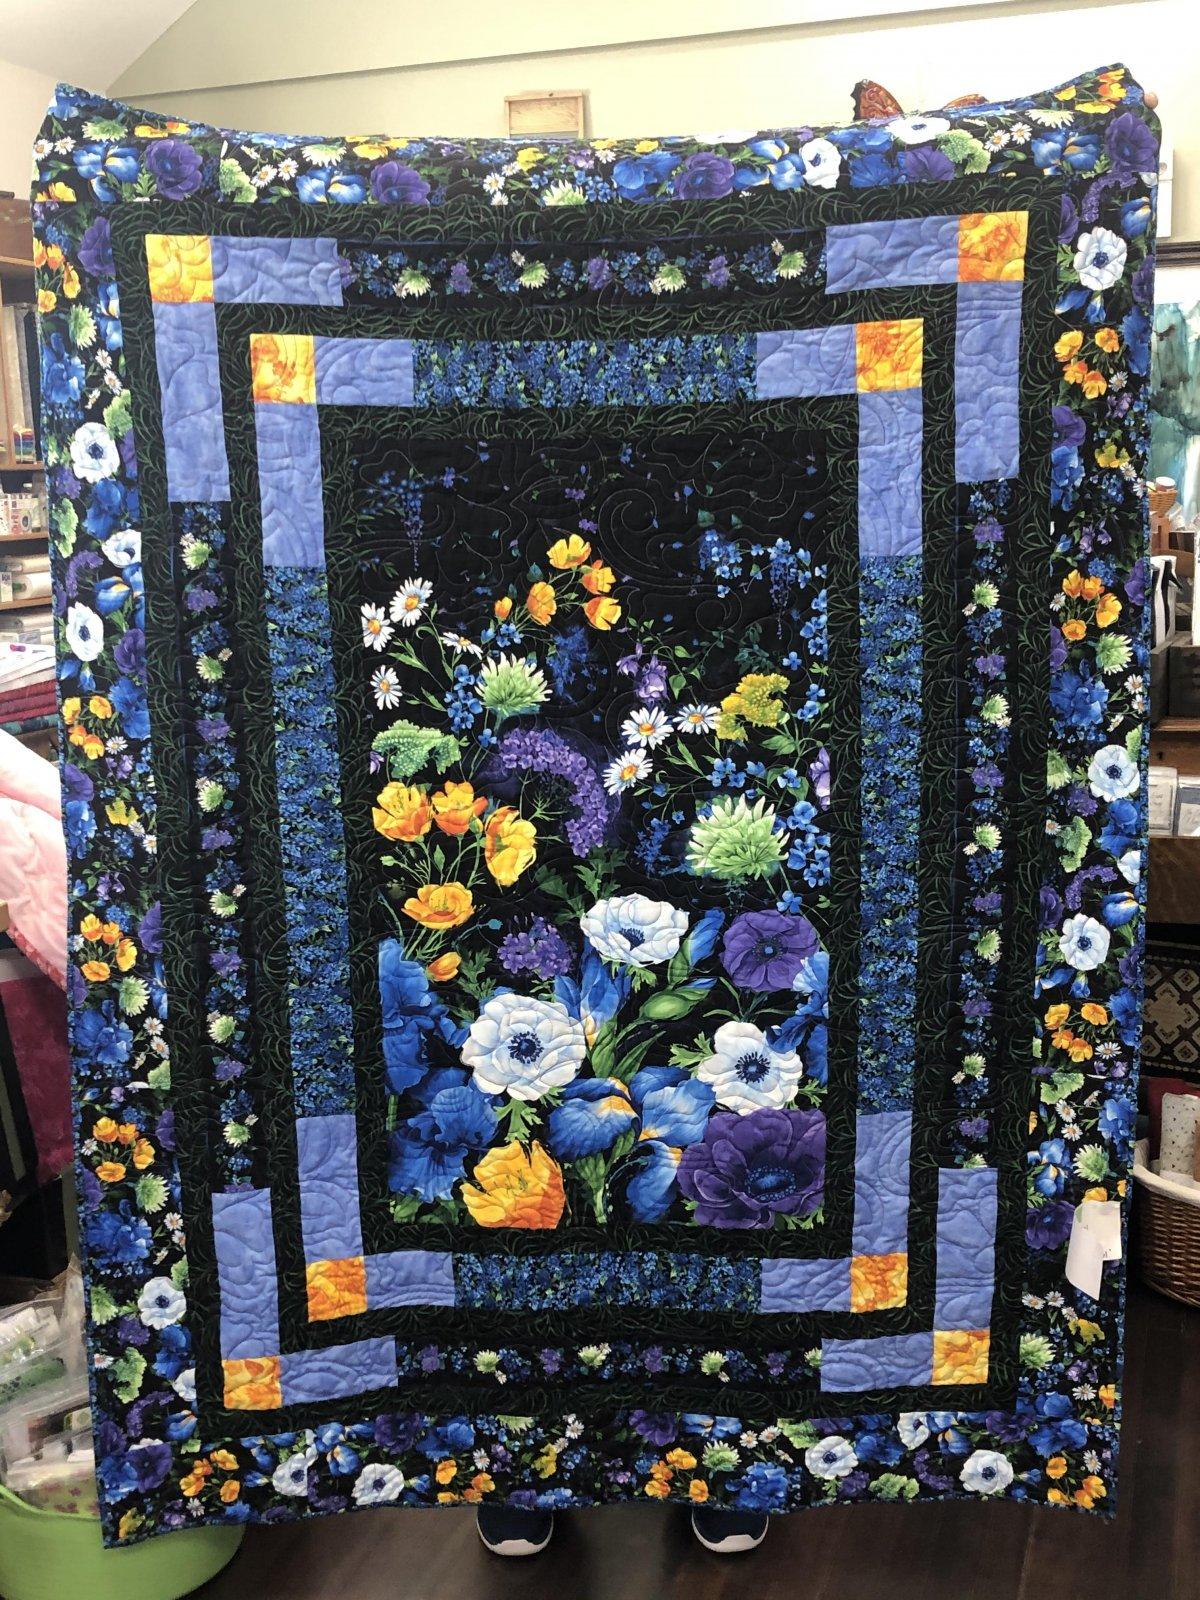 Quilt - Black & Blue Floral